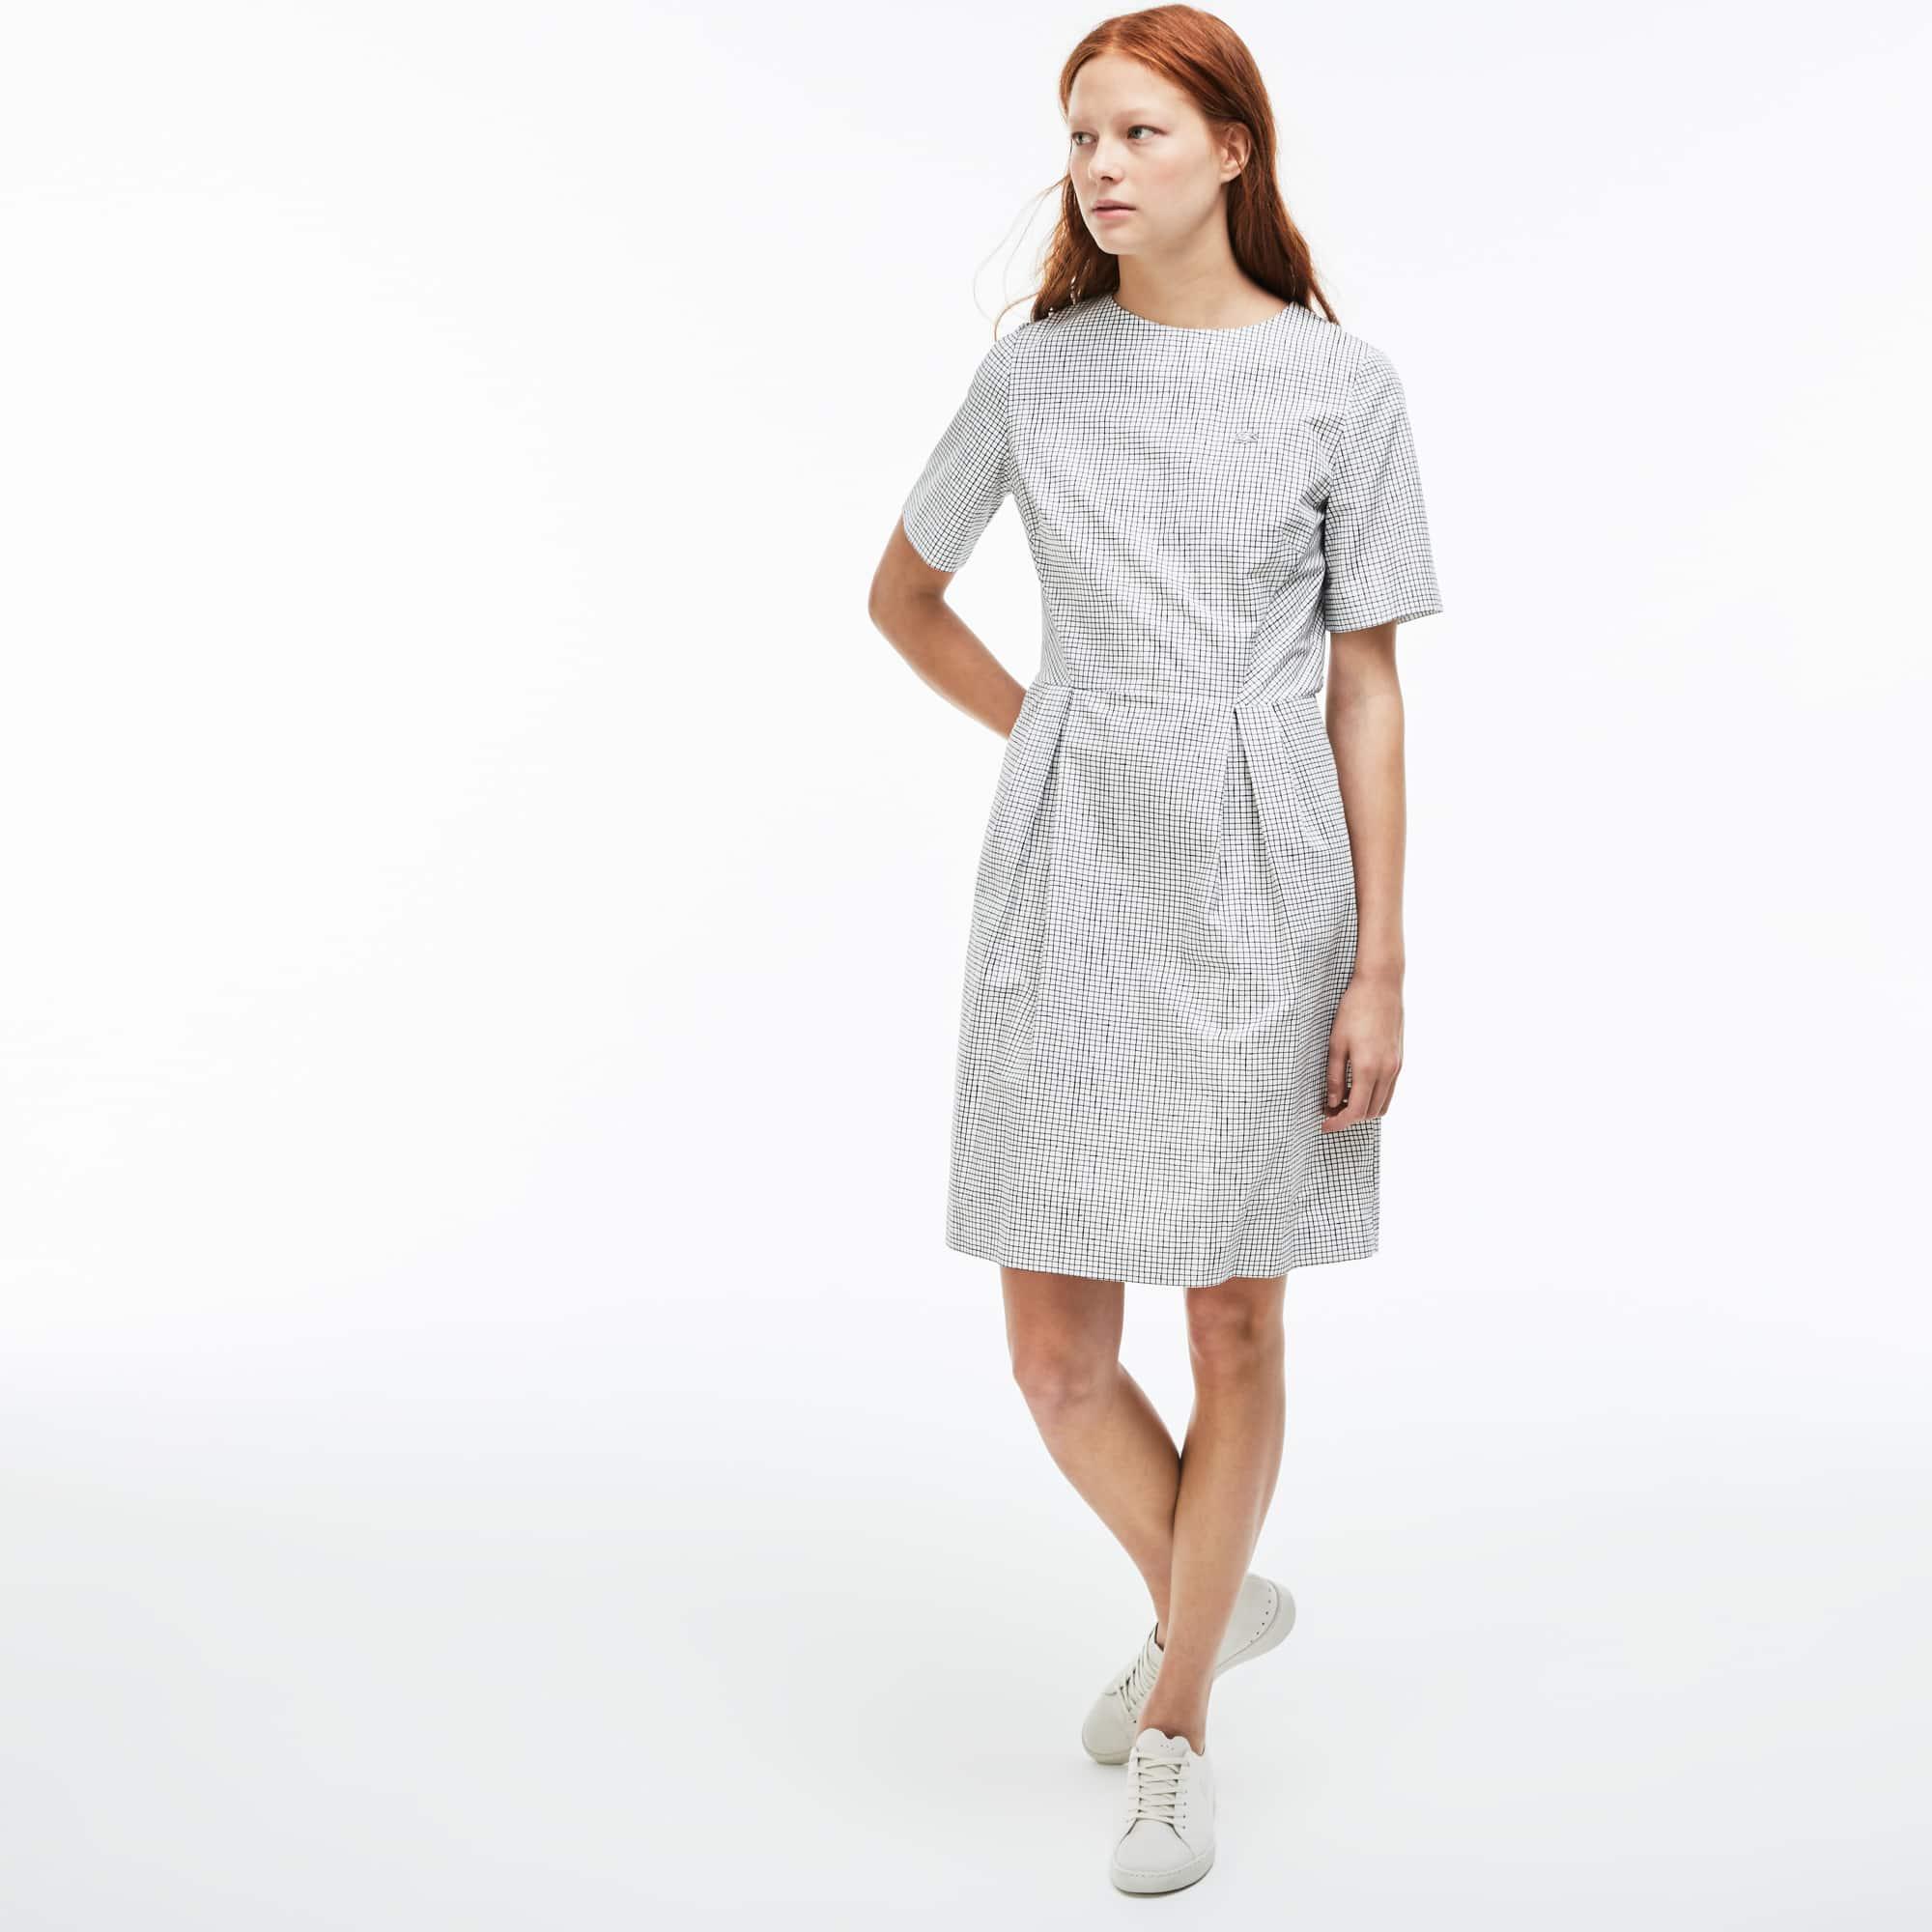 Chantaco cocktail dresses